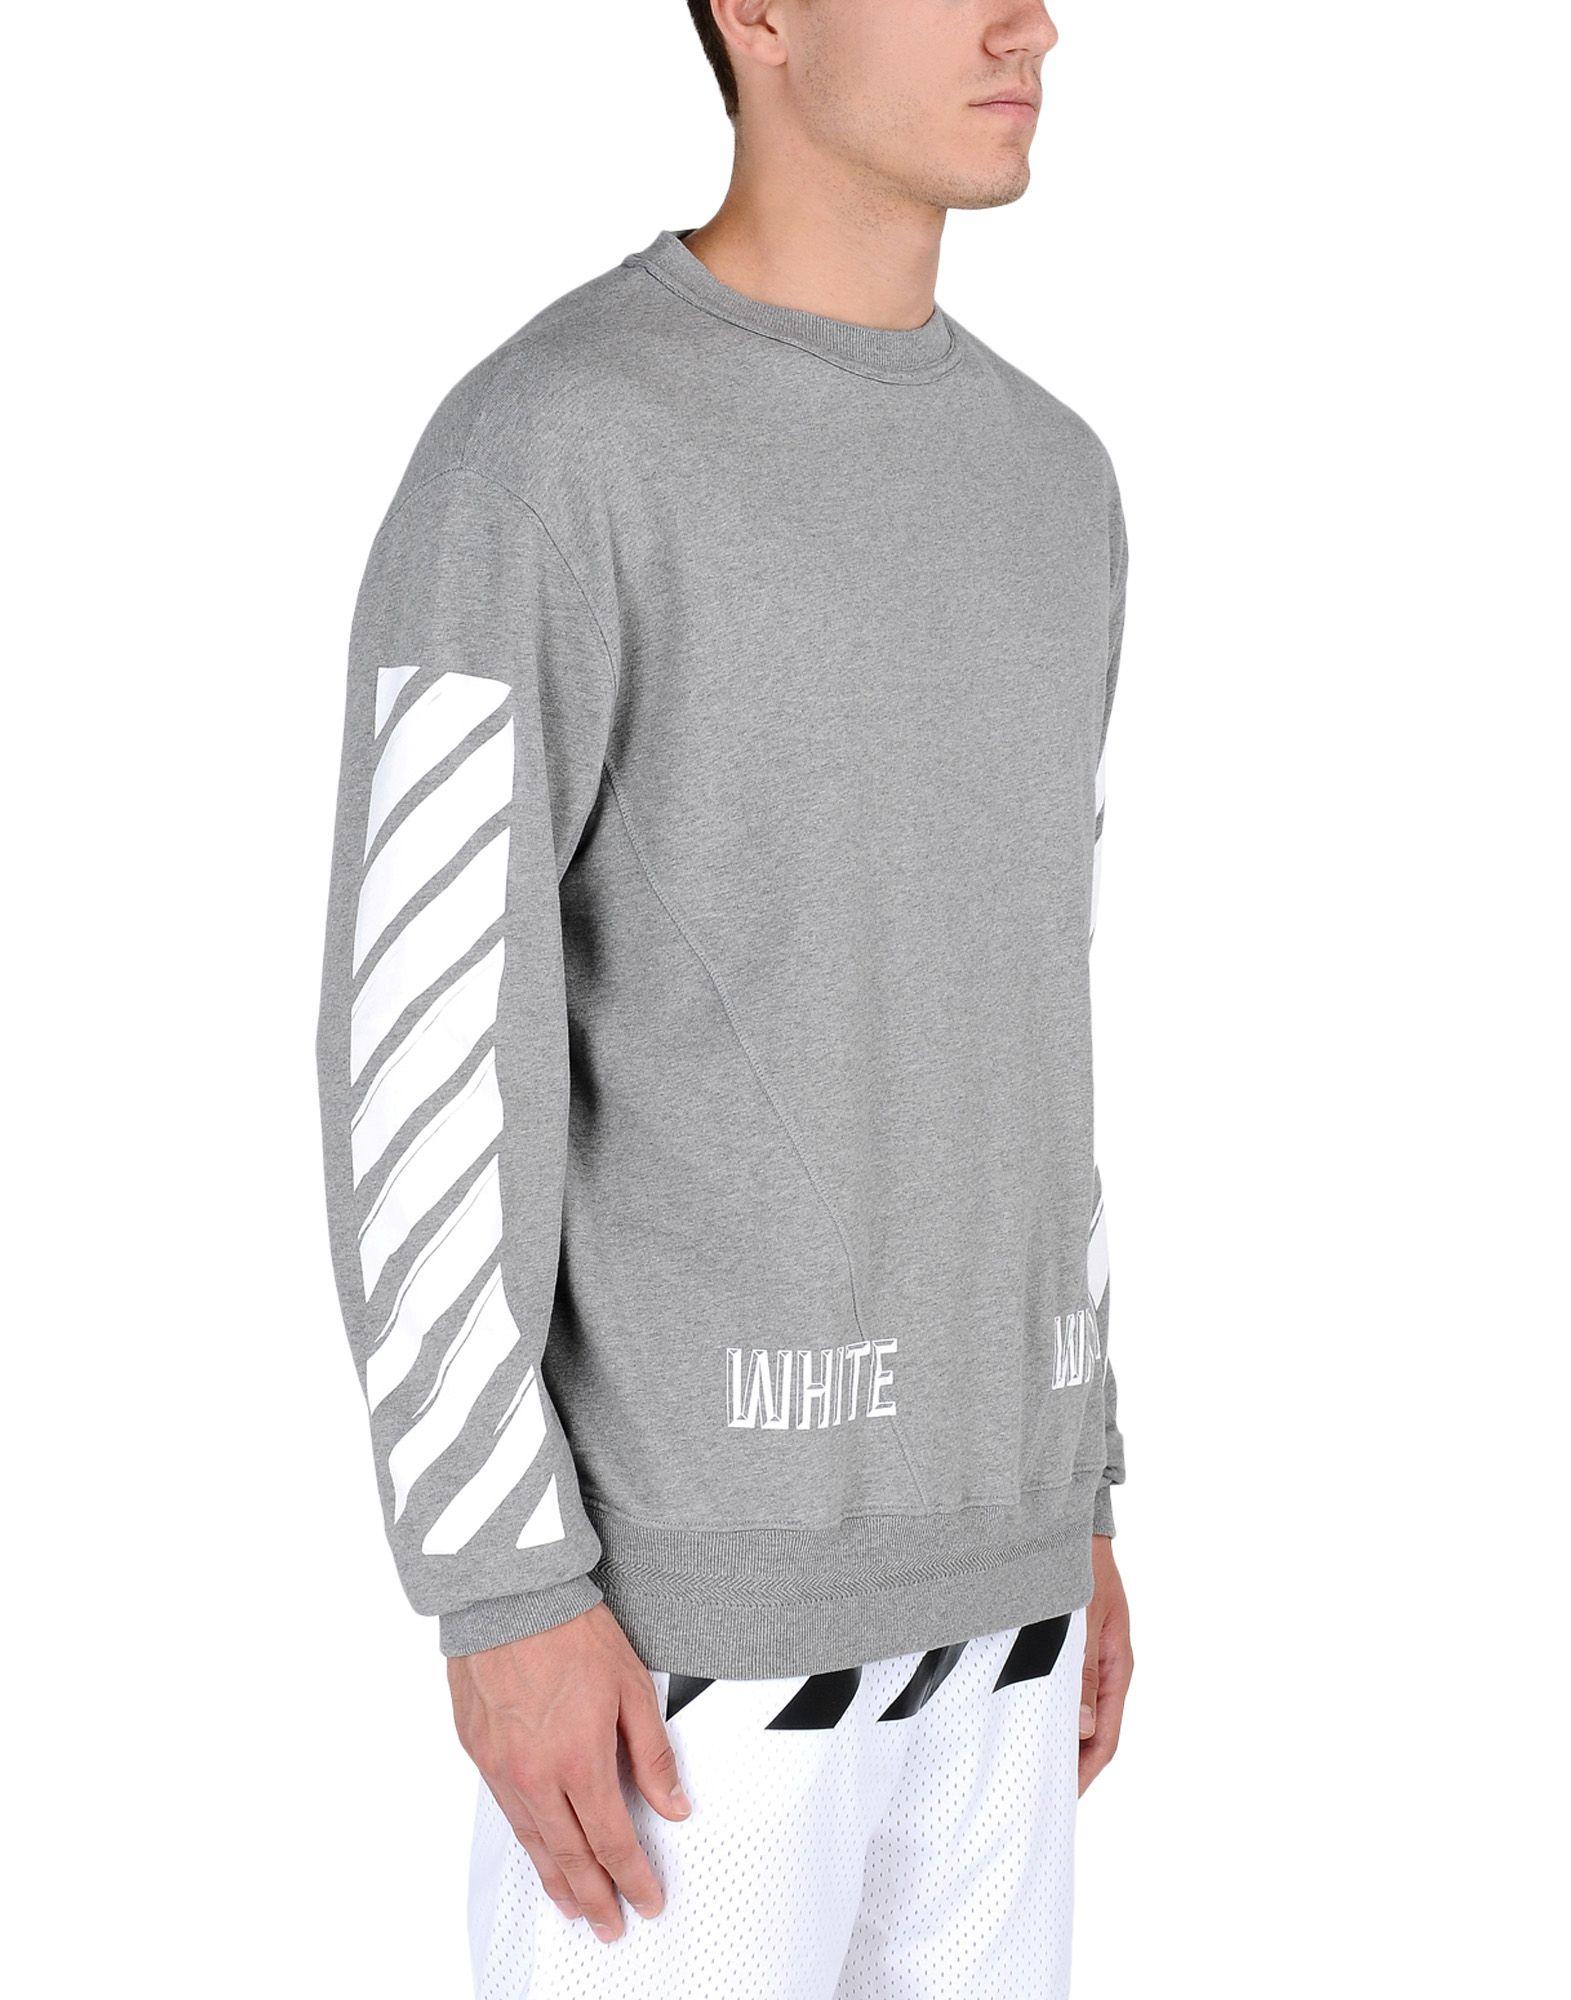 Off-white c/o virgil abloh Striped Cotton Sweatshirt in ...